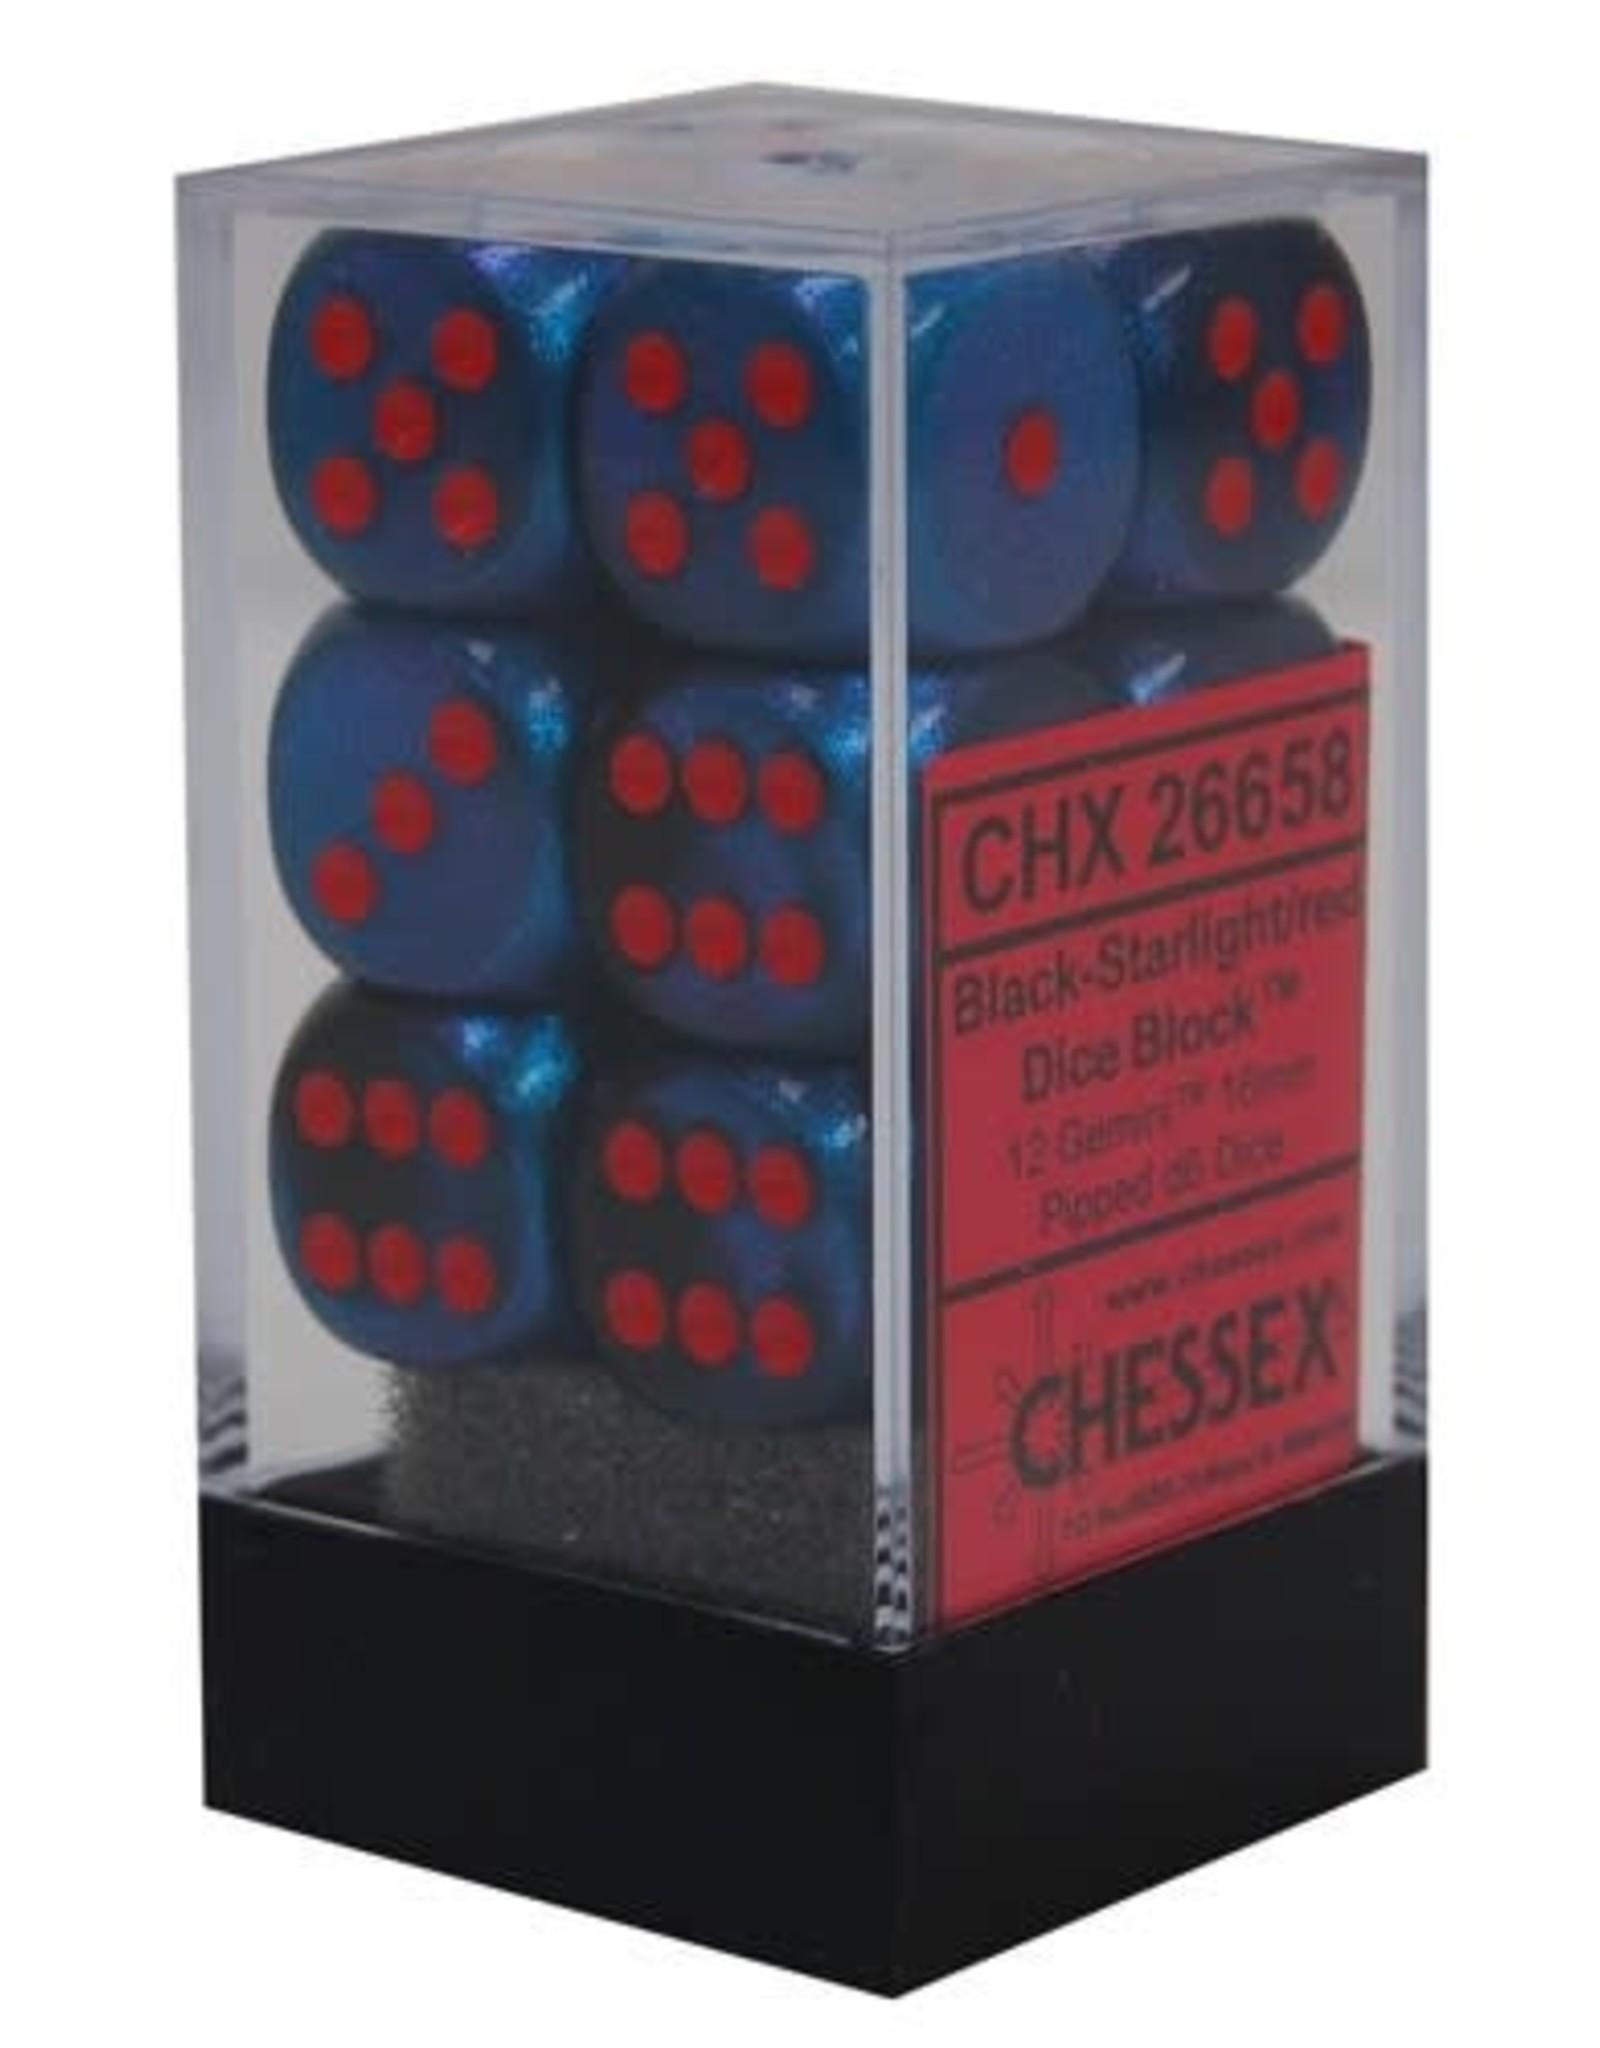 Chessex 12 Black-Starlight/red Gemini 16mm d6 Dice Block - CHX26658